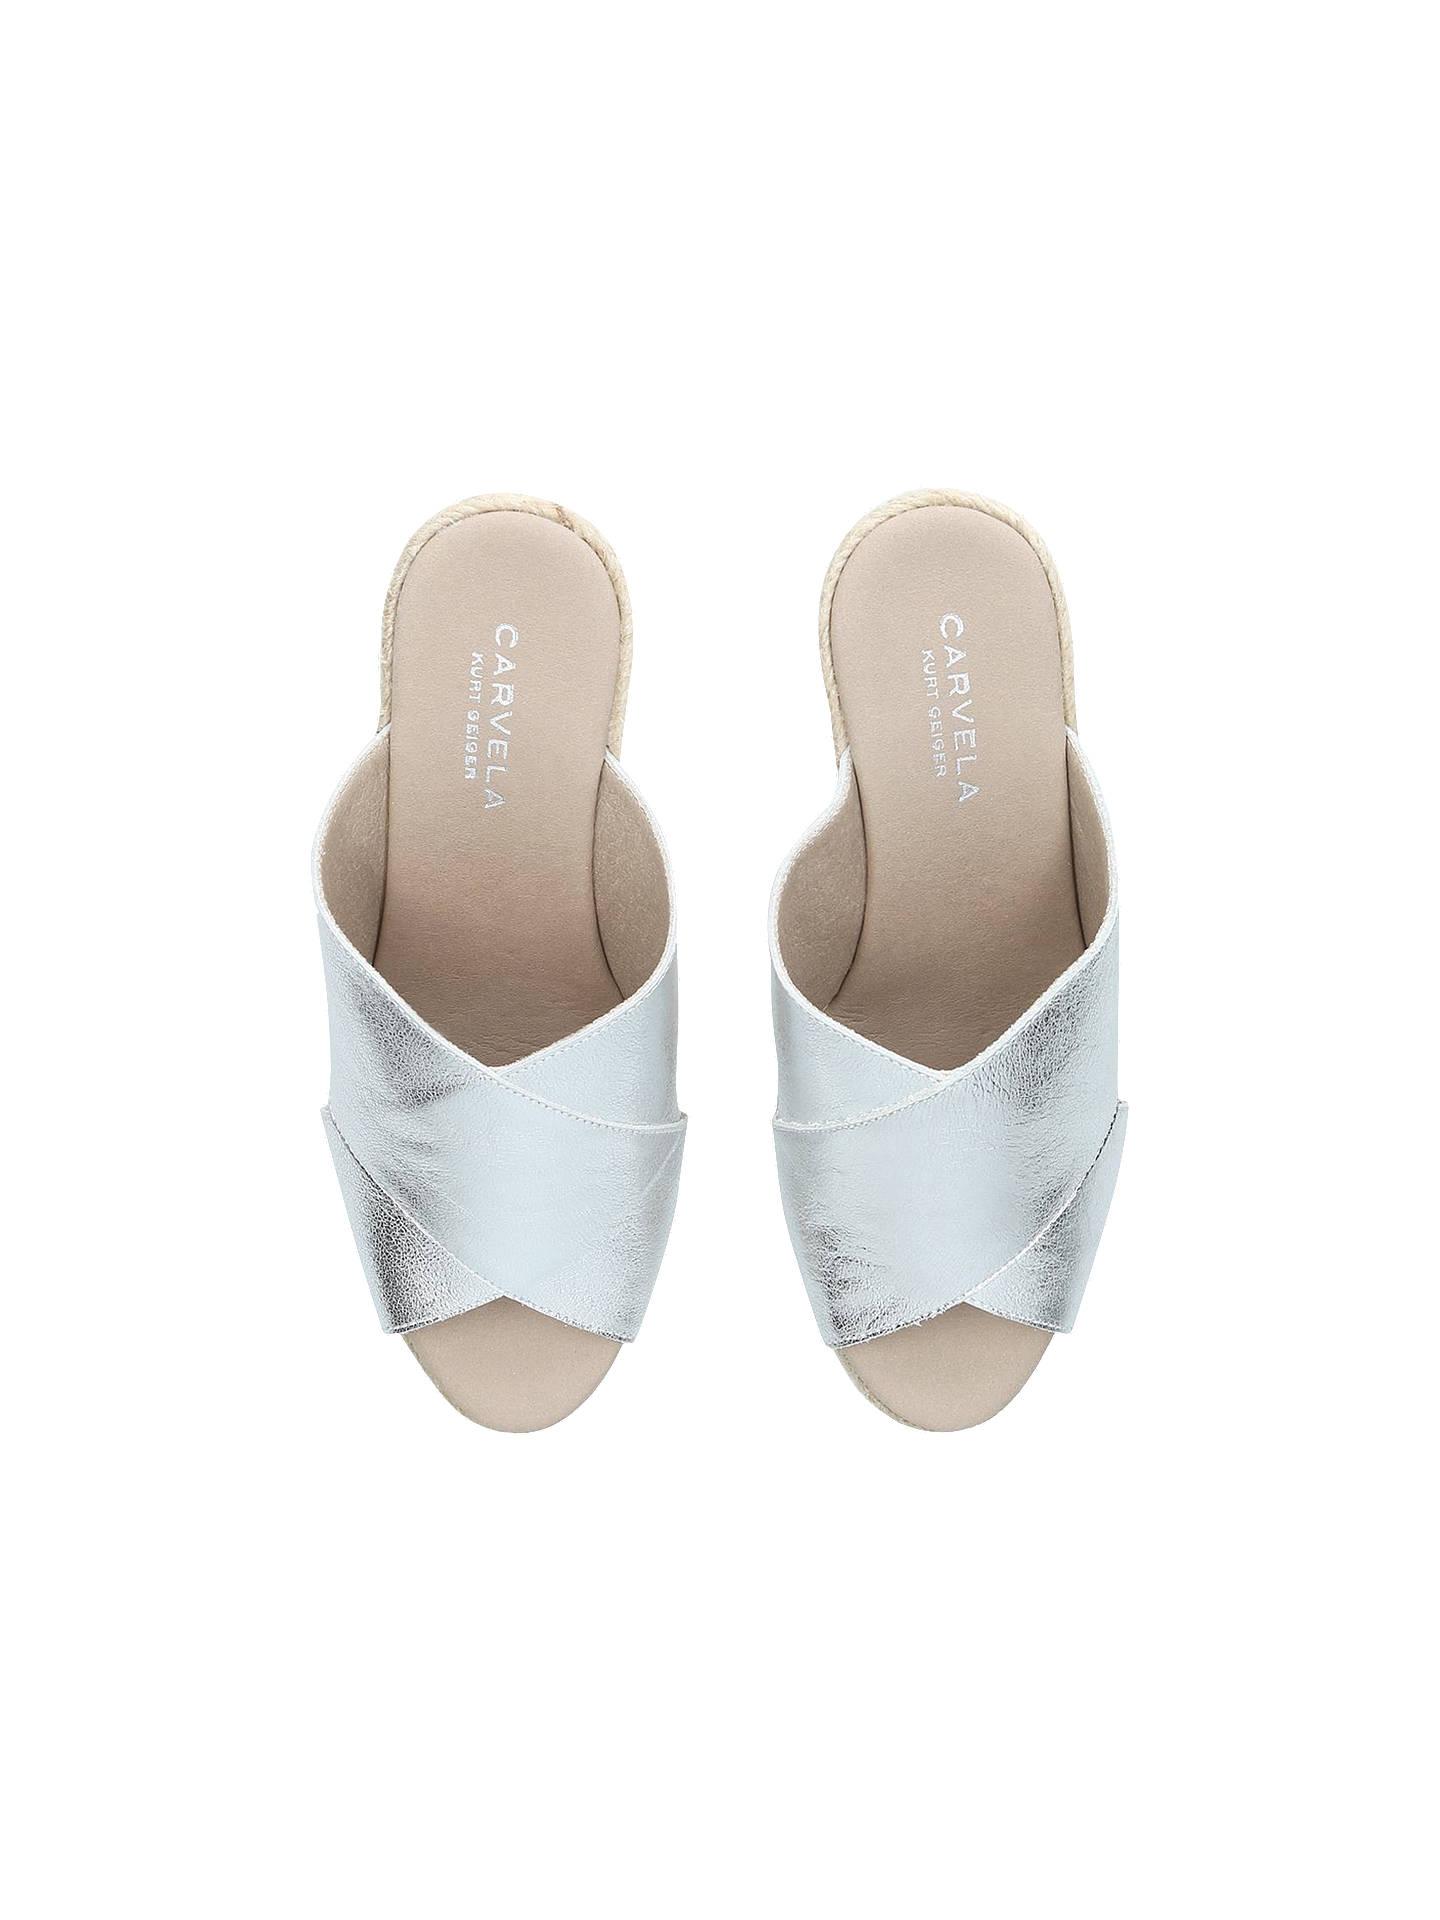 05153eba43c7 ... Buy Carvela Karp Leather Wedge Heel Sandals